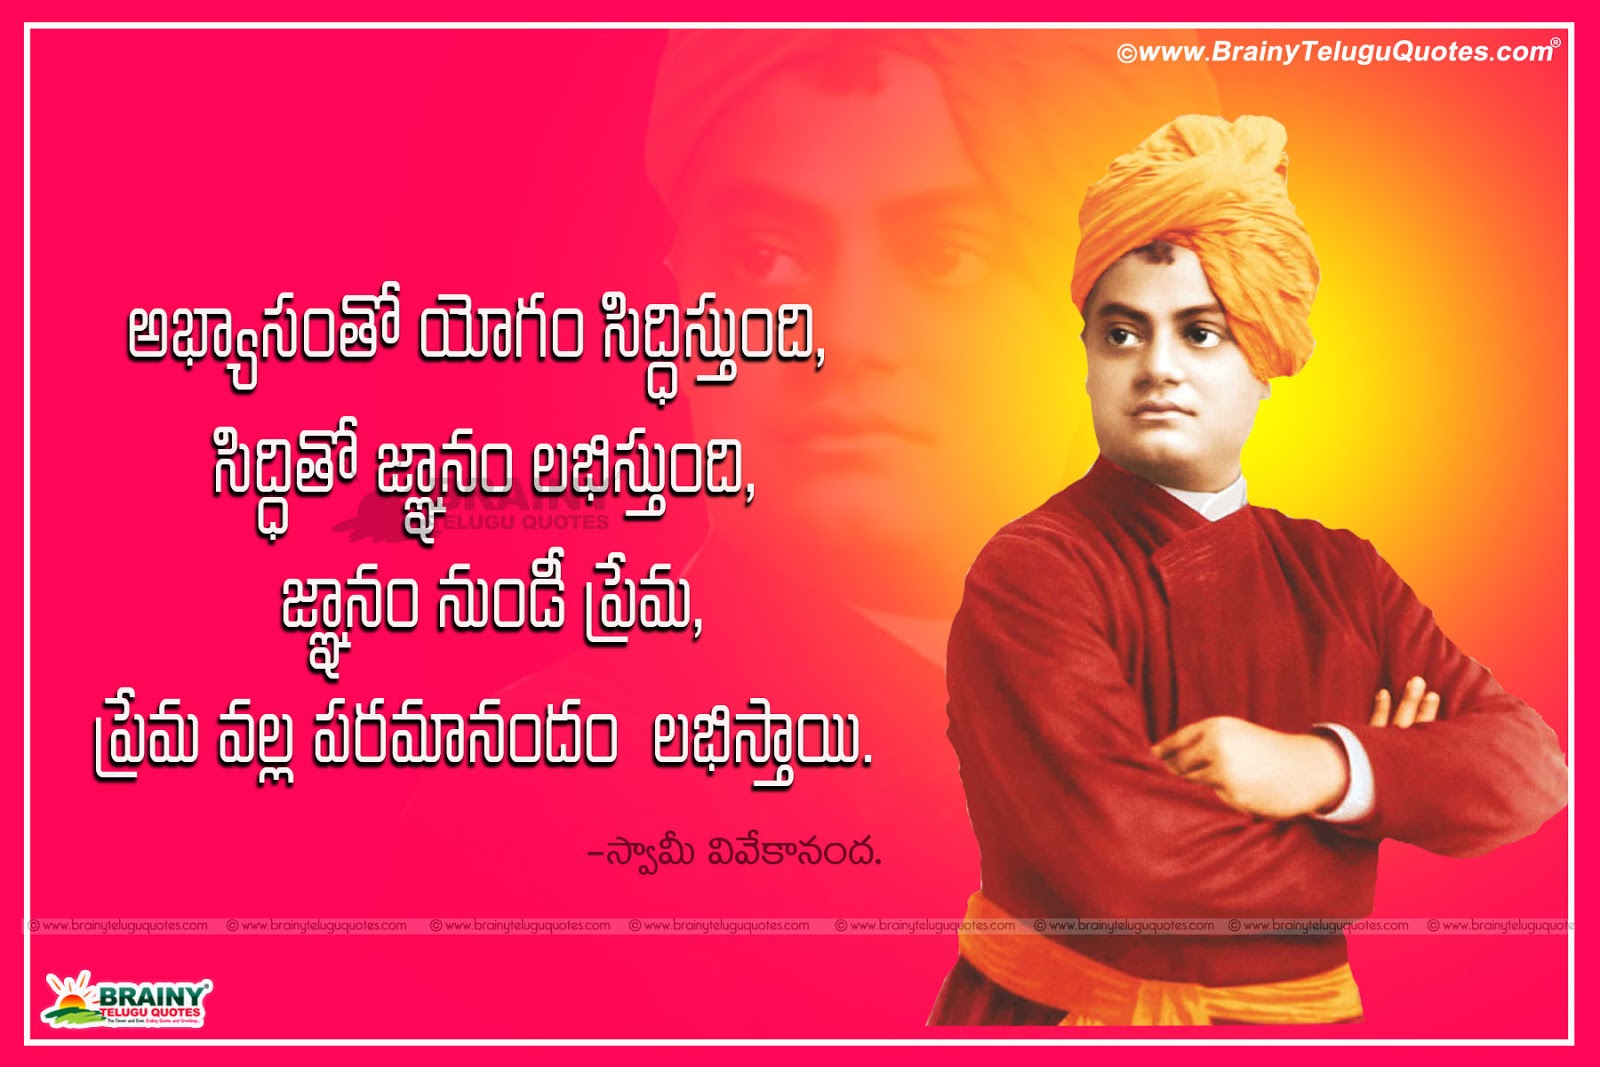 swami vivekananda quotes quotesgram. inspirational quotes ...